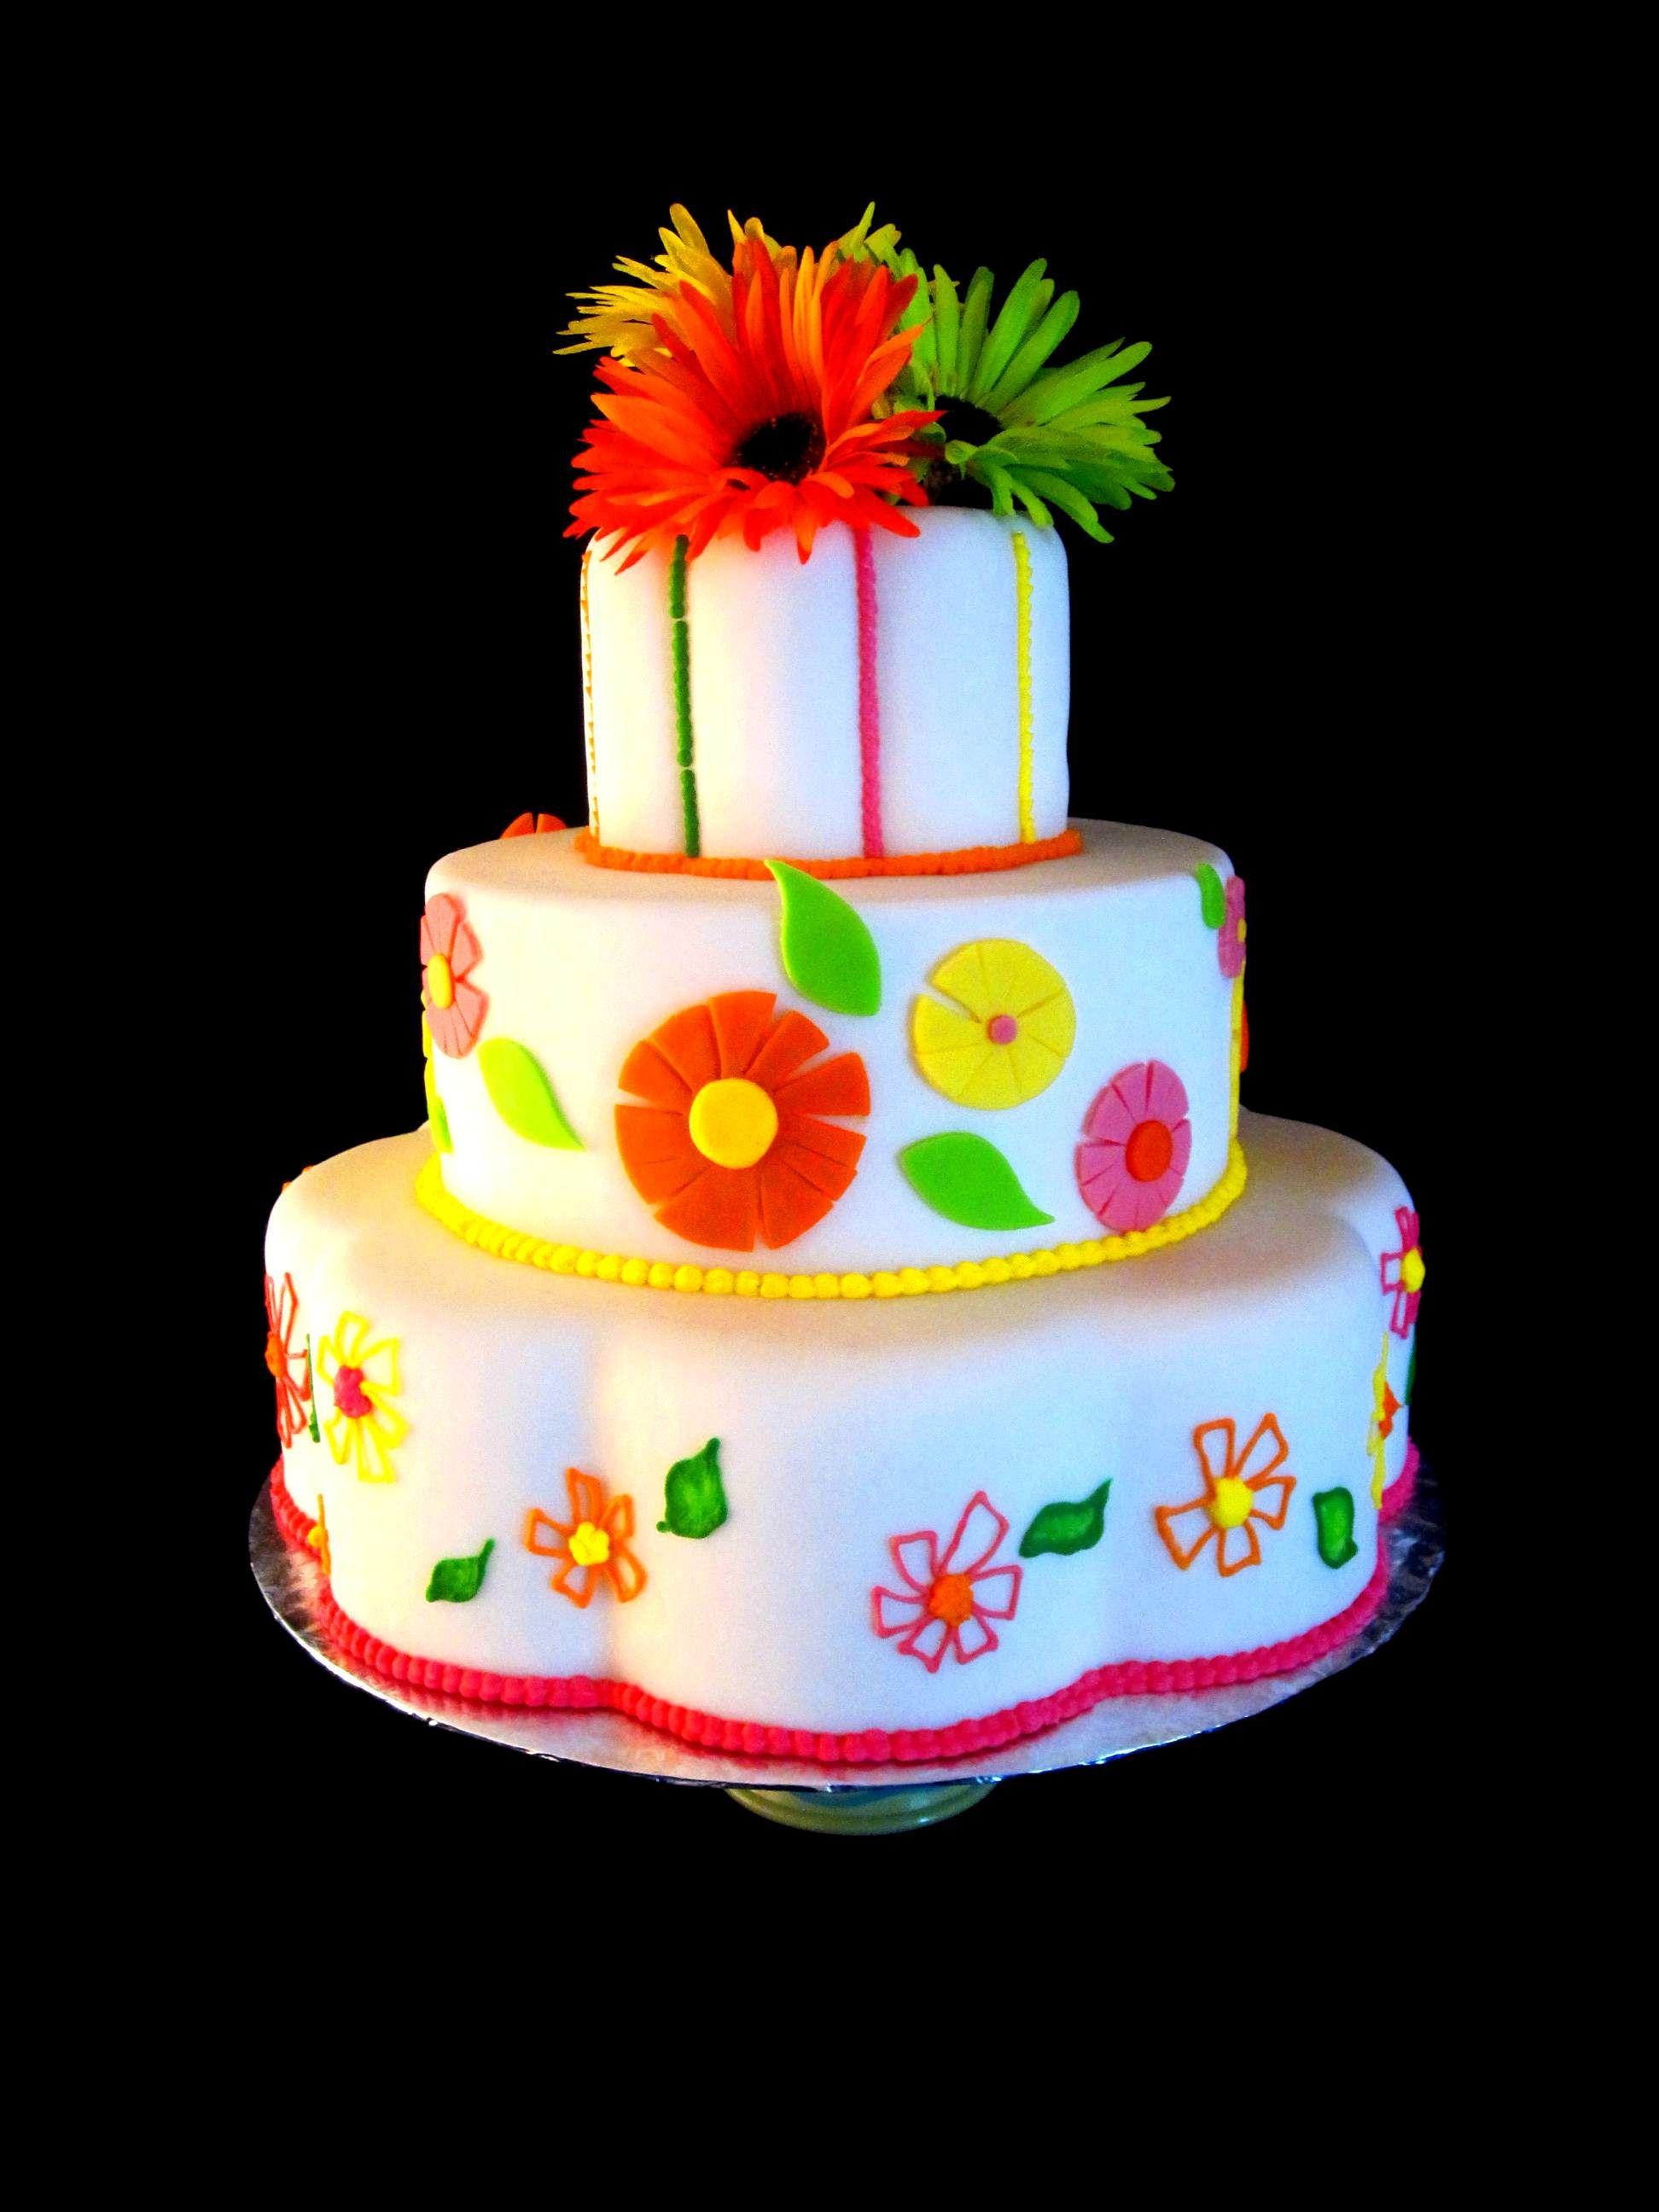 Whimsical Fondant Gerber Daisy Wedding Cake Wedding Cake Cake And